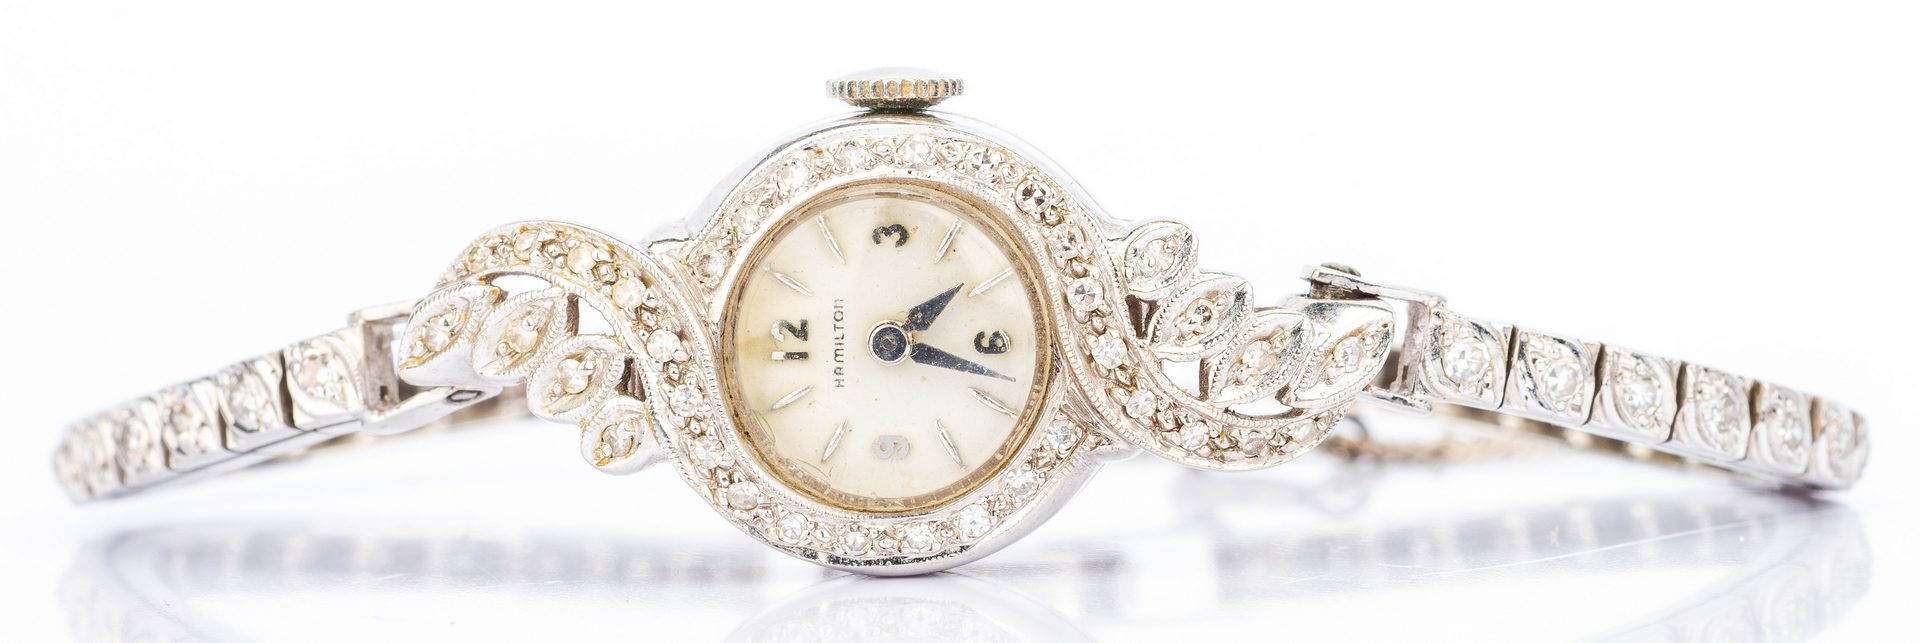 Lot 395: 2 Vintage Diamond Watches, Art Deco